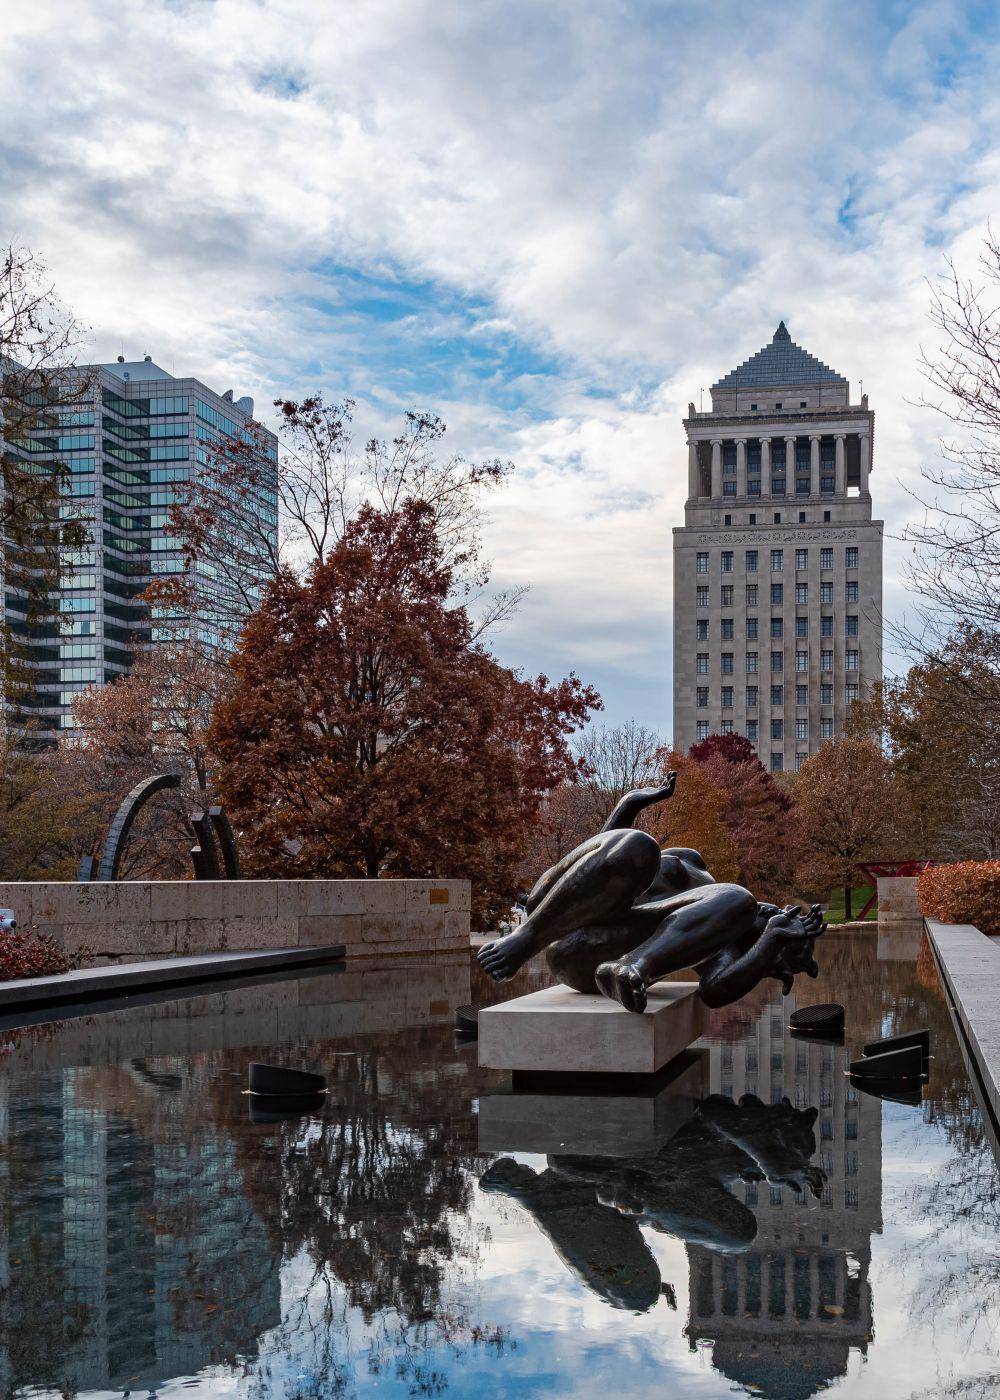 Citygarden Sculpture Par, USA